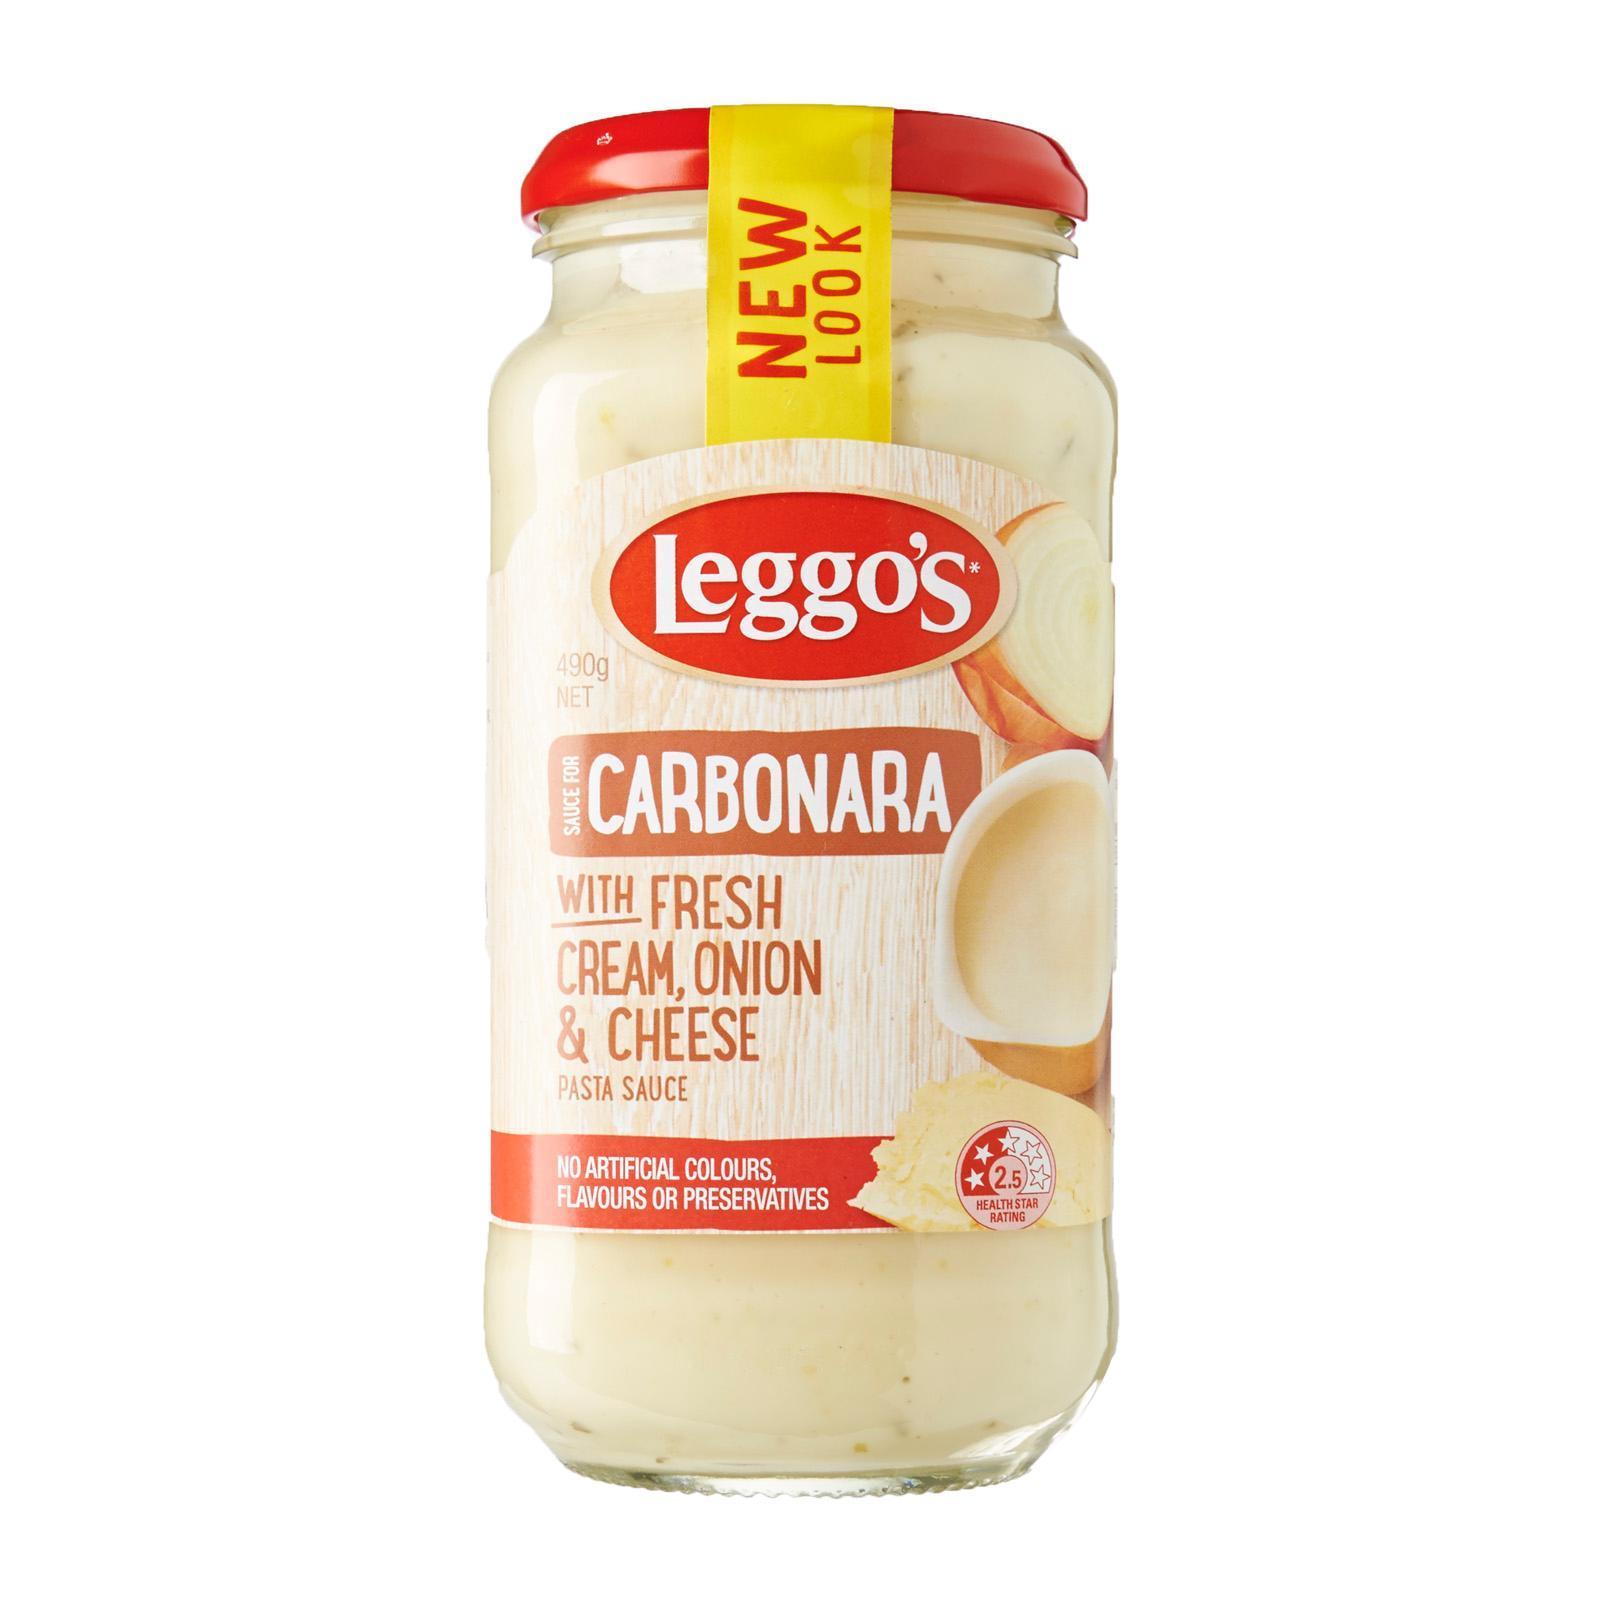 Leggo's Carbonara Creamy Pasta Sauce